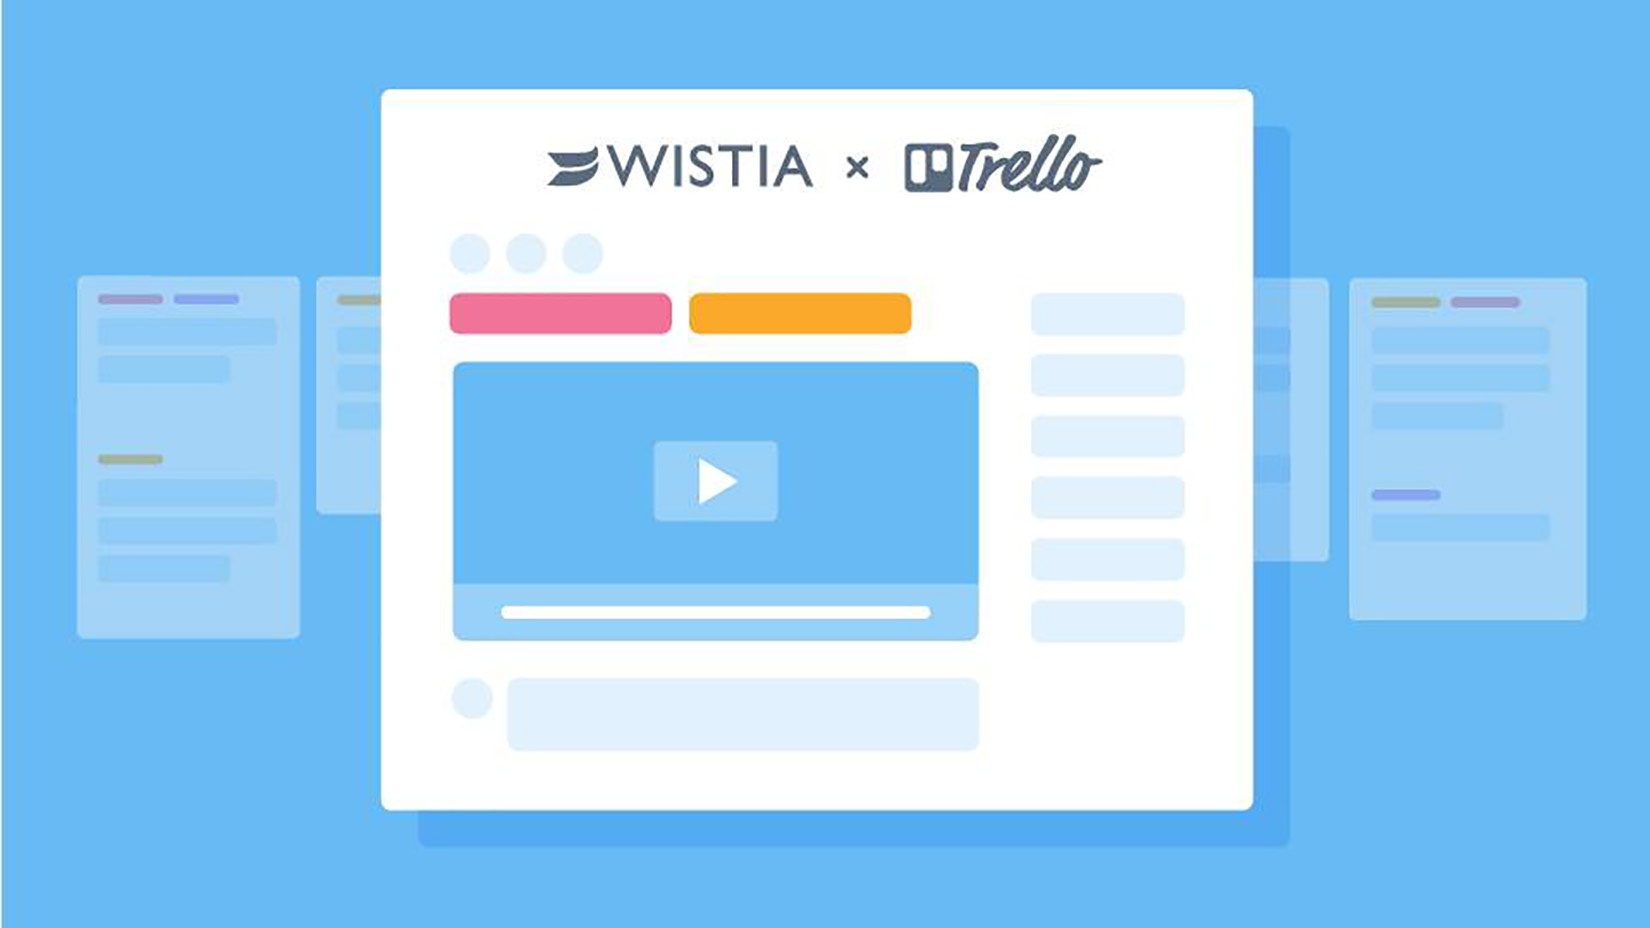 Wistia_Trello_Power_Up_v3